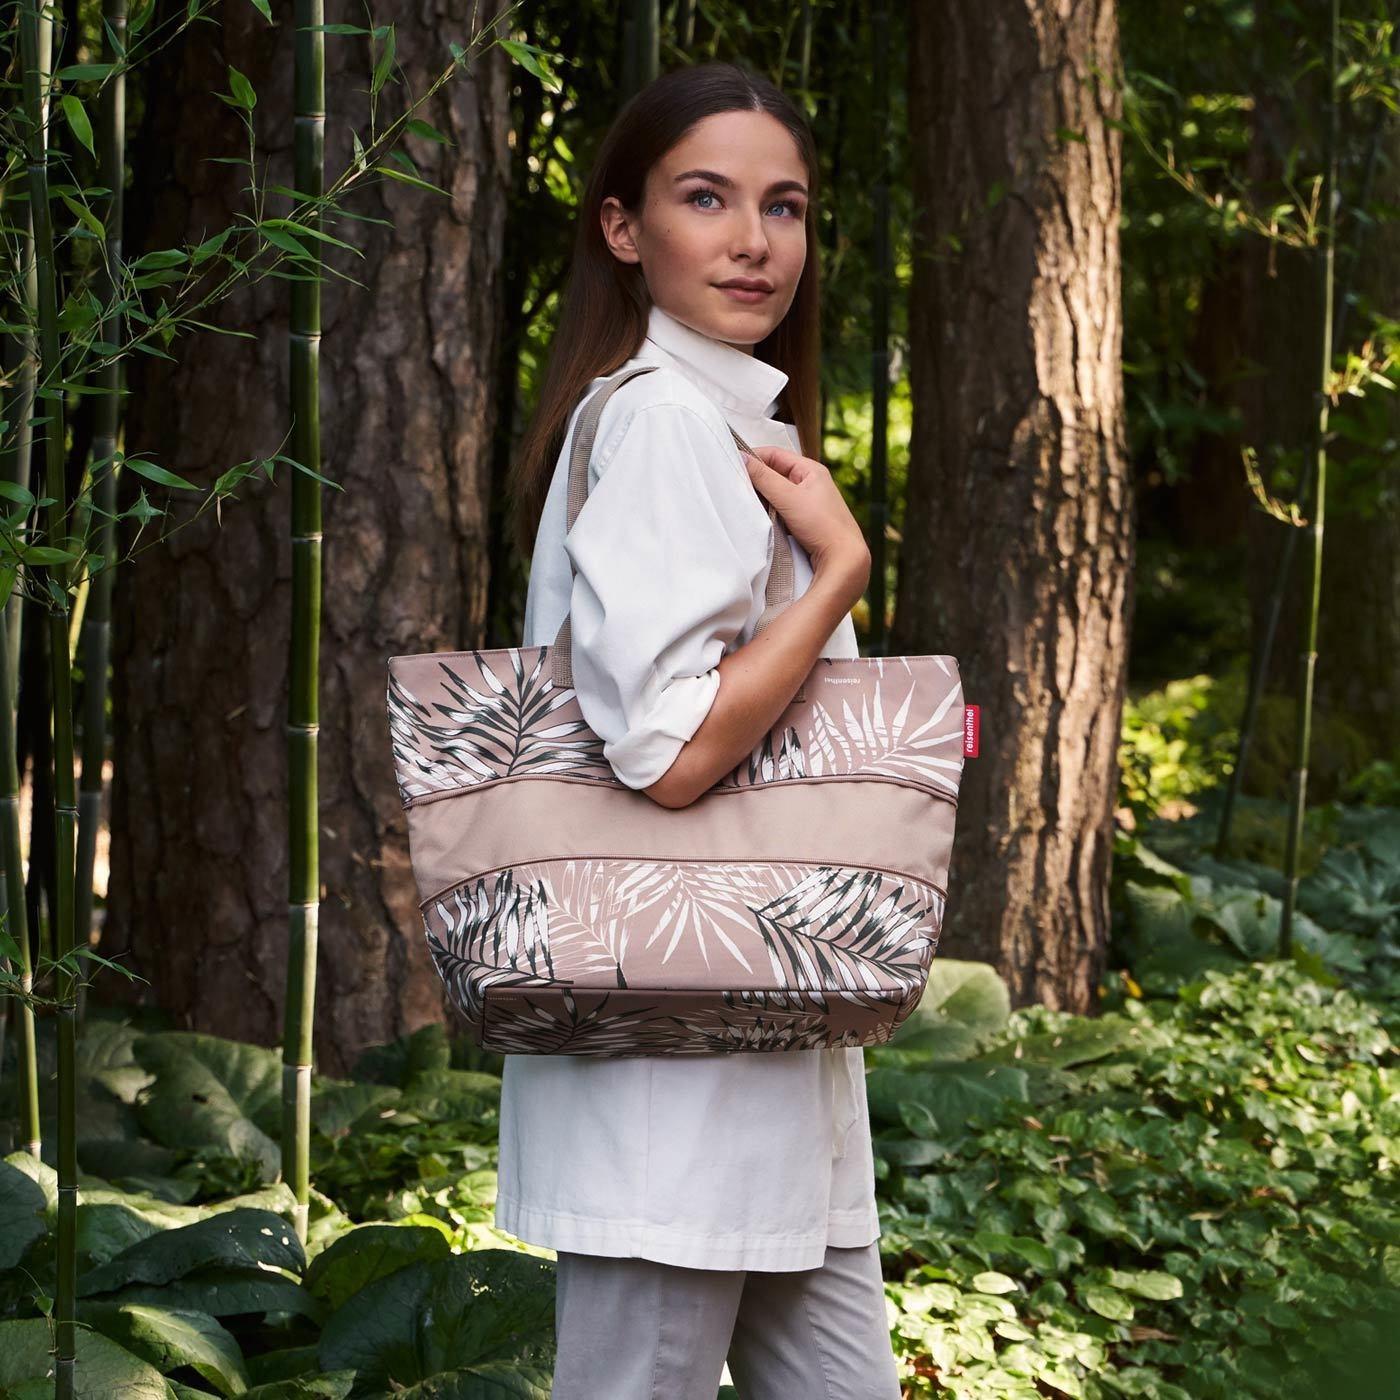 Chytrá taška přes rameno Shopper e1 jungle sand_0